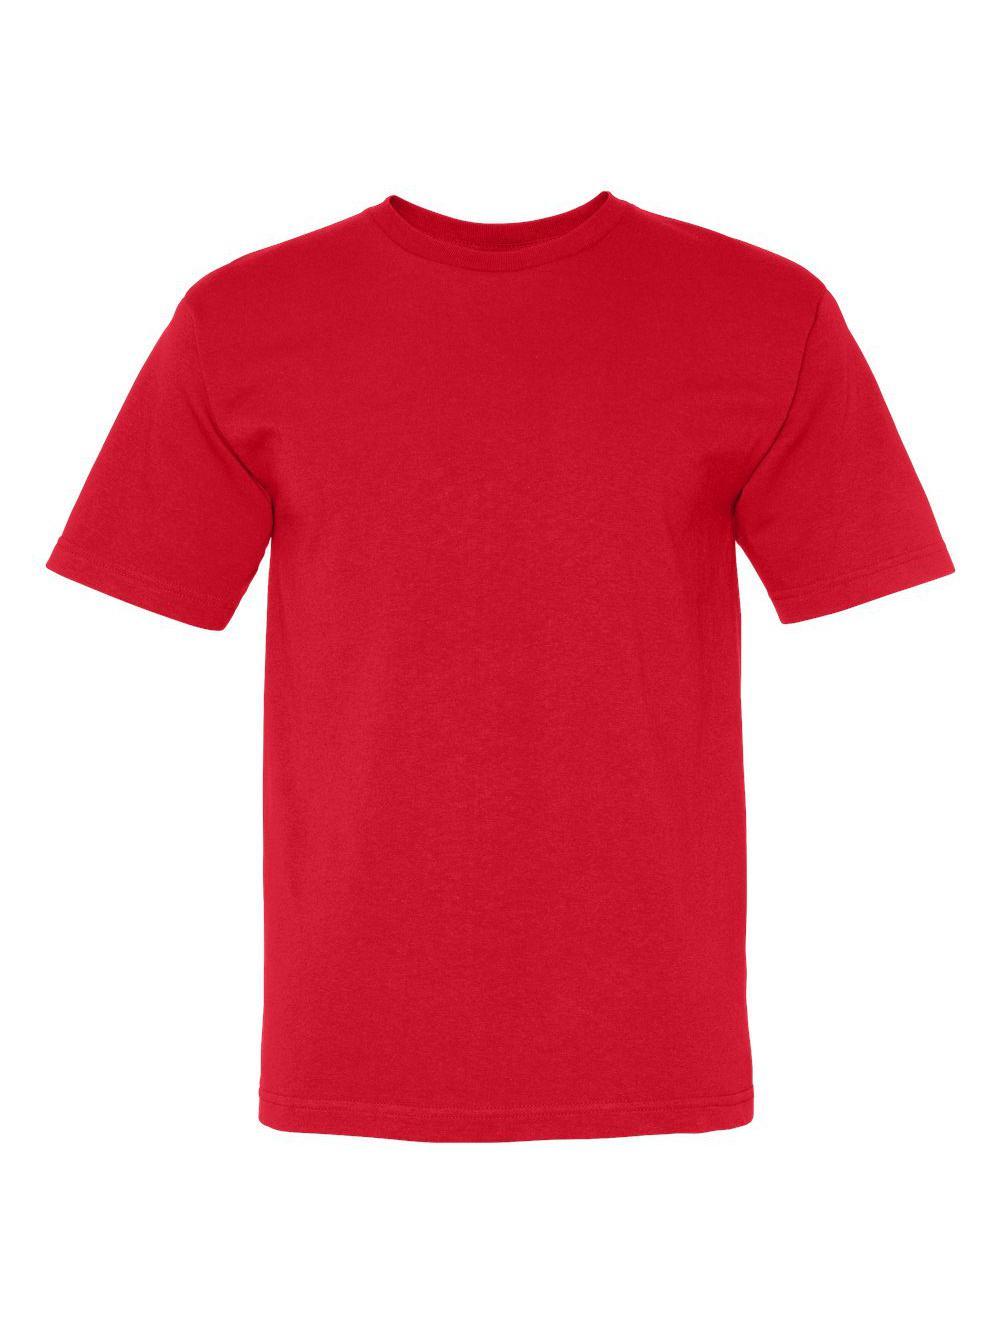 Bayside-USA-Made-100-Cotton-Short-Sleeve-T-Shirt-5040 thumbnail 27